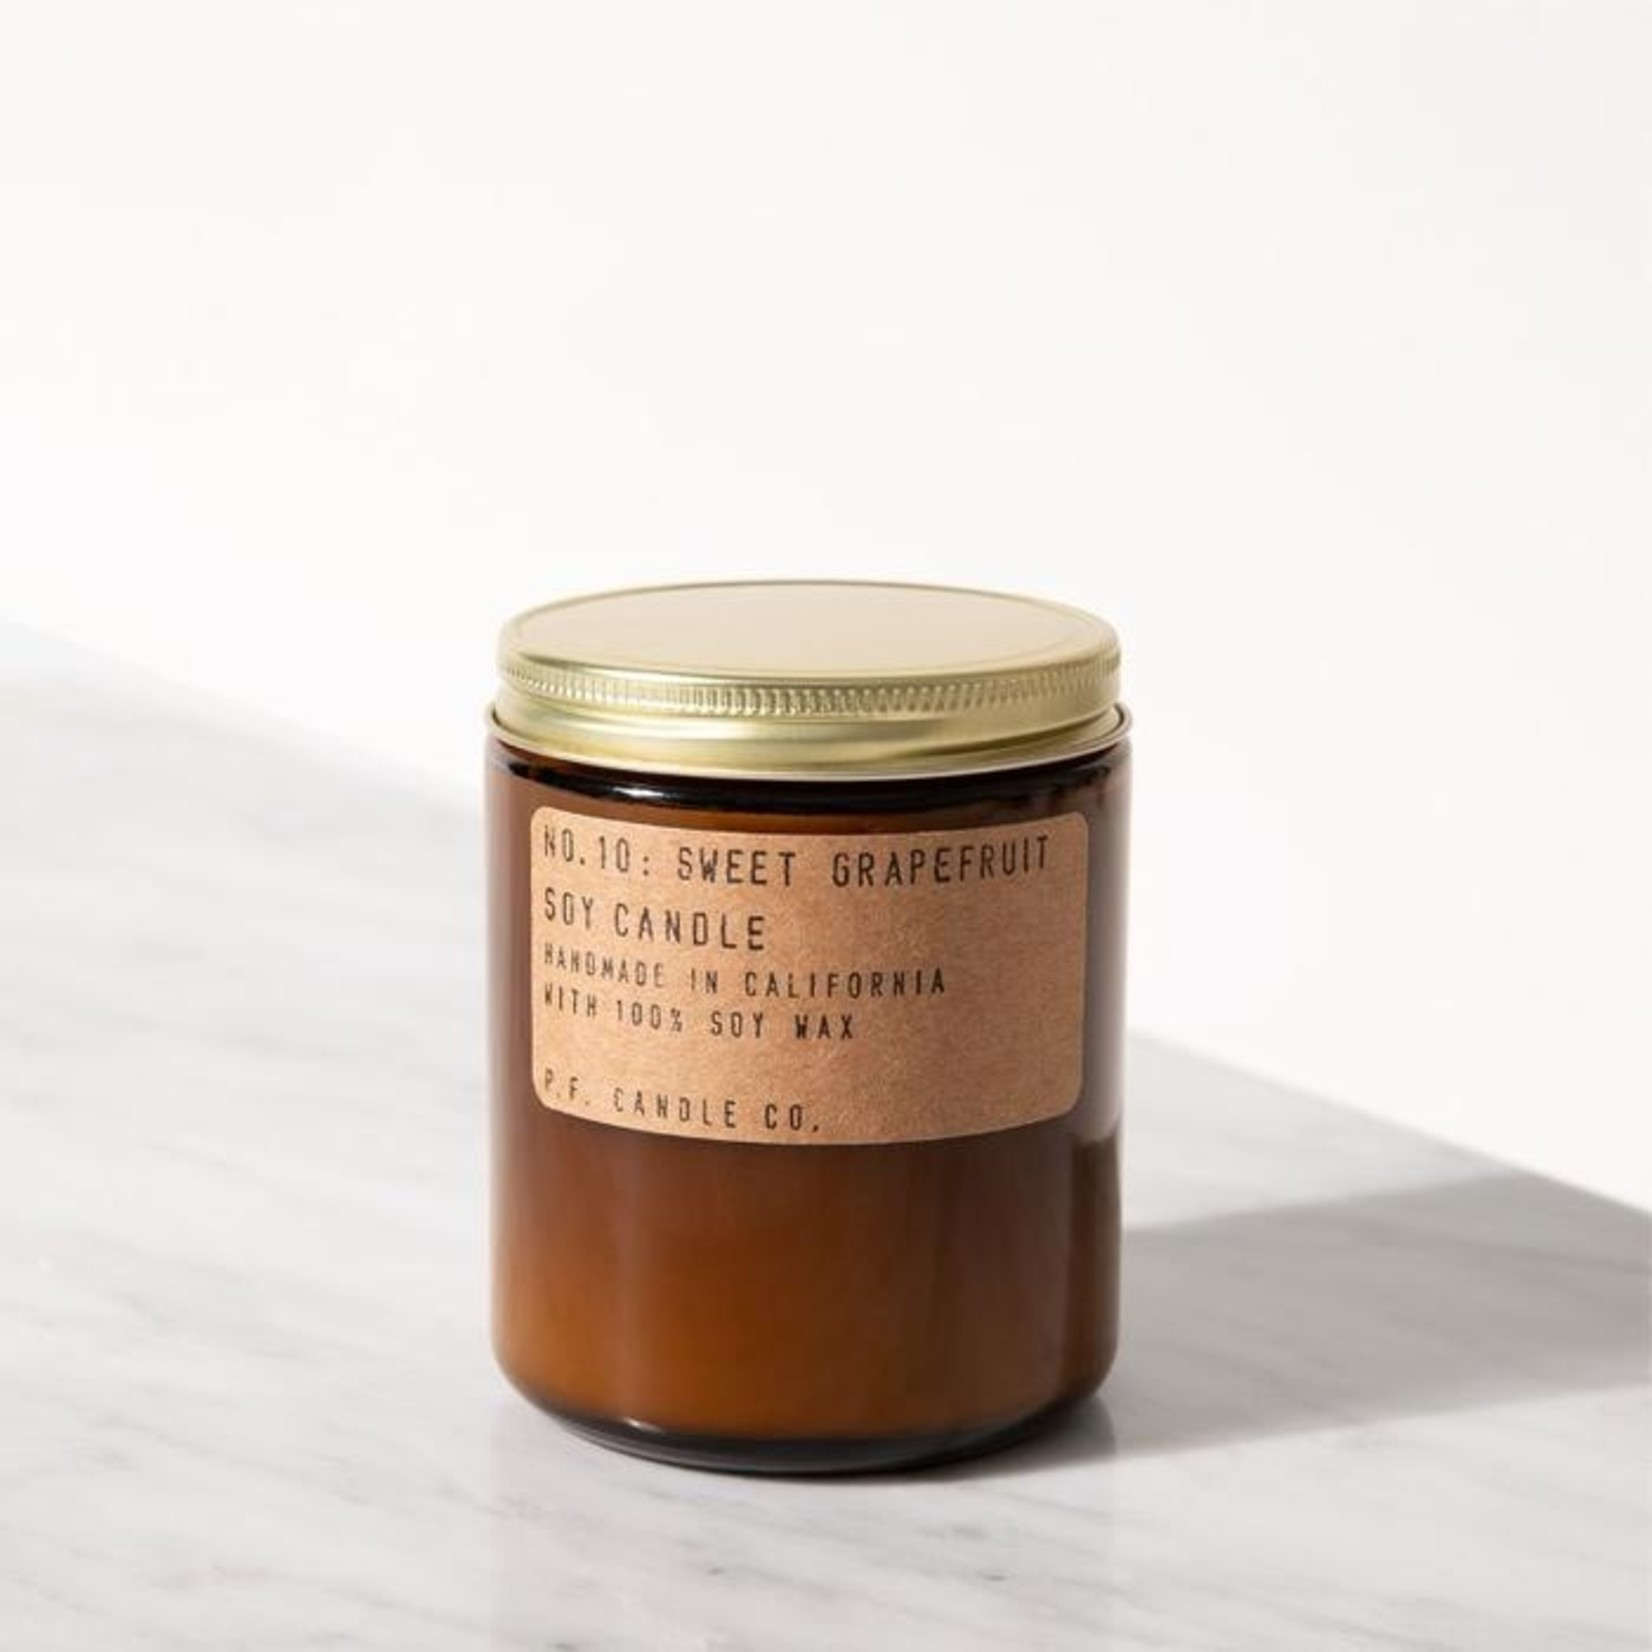 PF Candle Co Grapefruit Candle (7.2 oz)